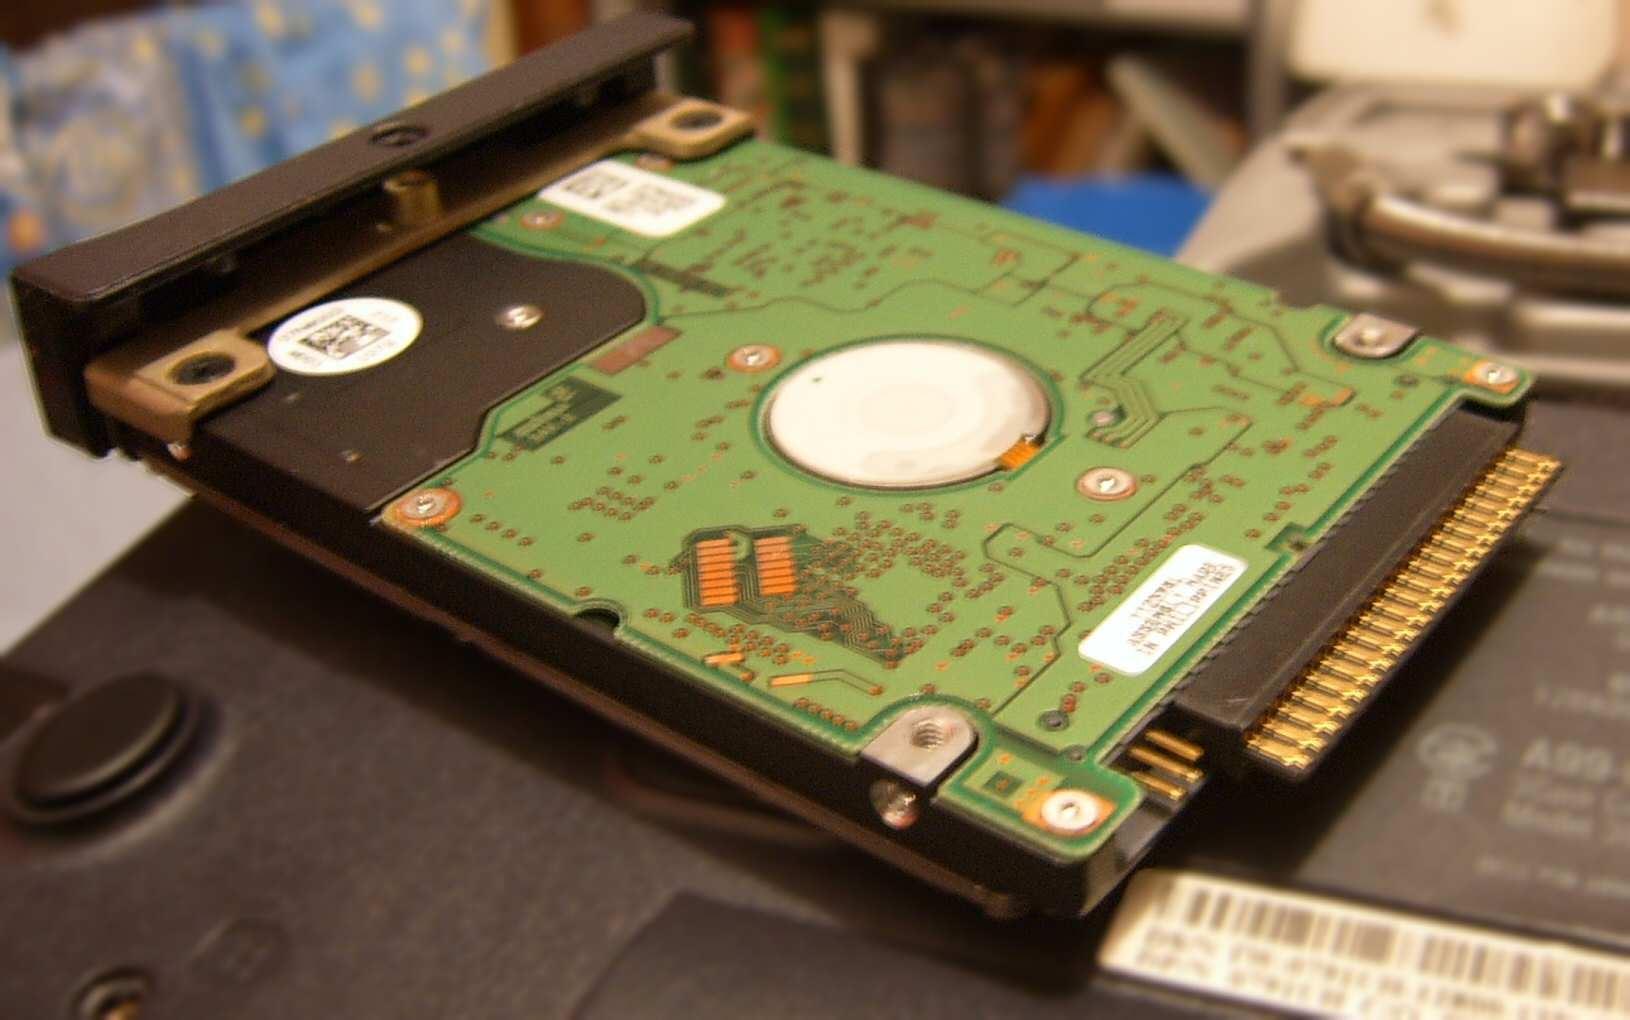 Dell Laptop Repairs Brisbane, Dell Computer Repairs